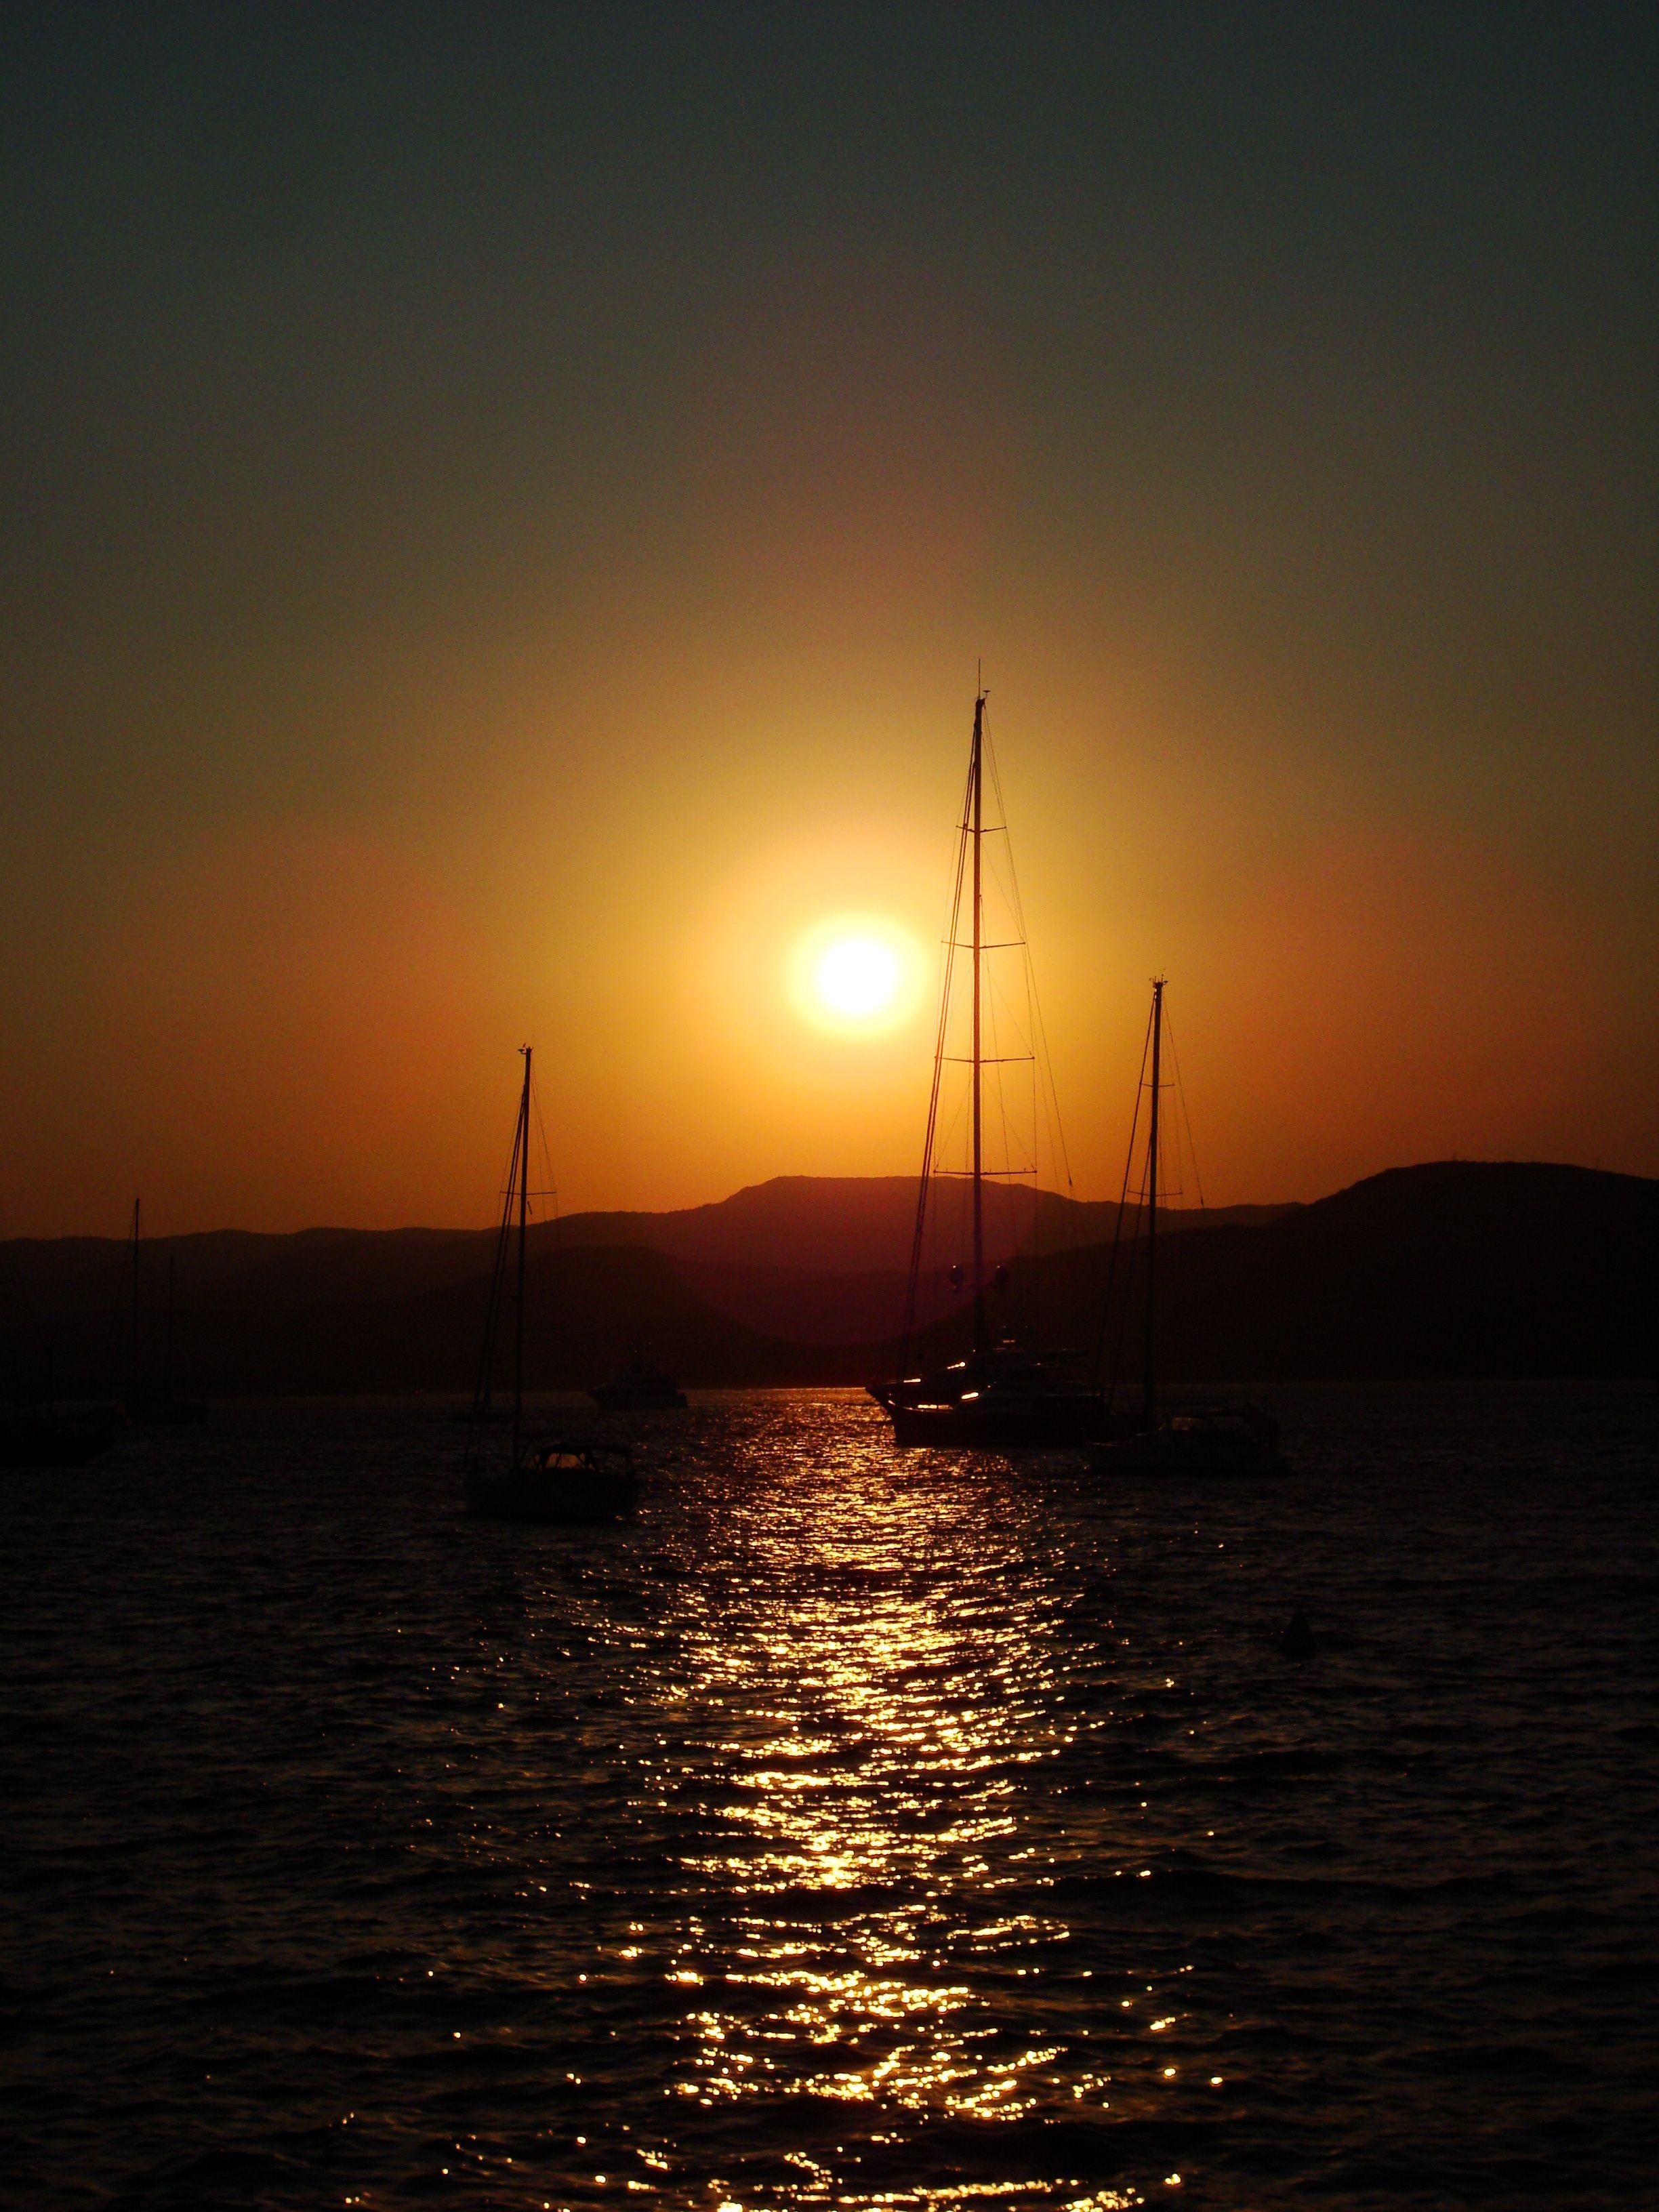 Sunset at St. Tropez